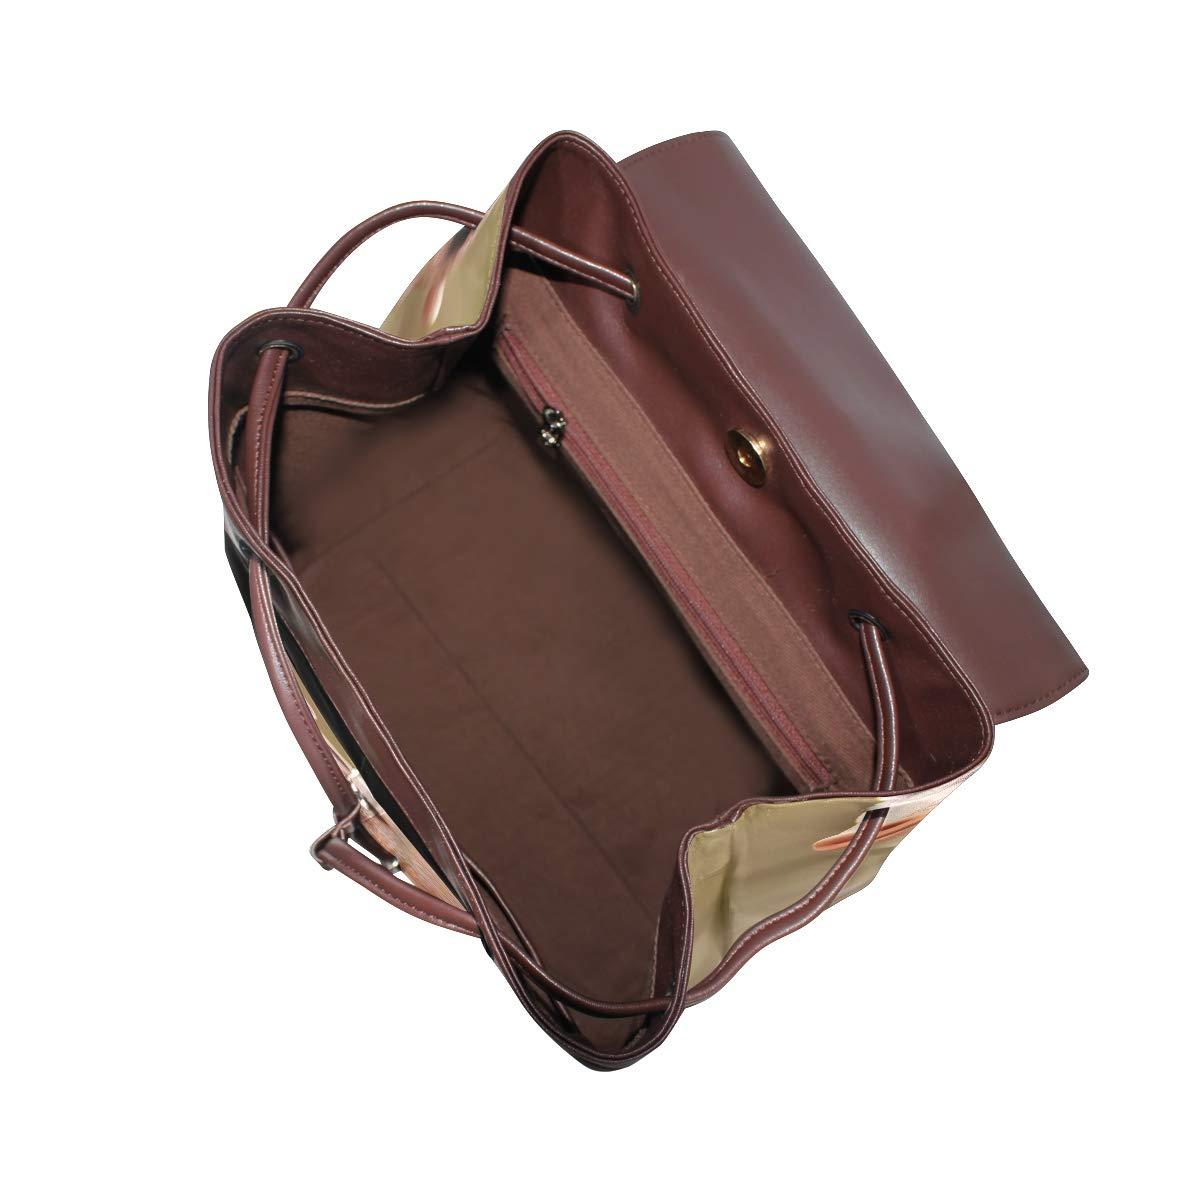 PU Leather Shoulder Bag,Little Cute Baby Pig Backpack,Portable Travel School Rucksack,Satchel with Top Handle